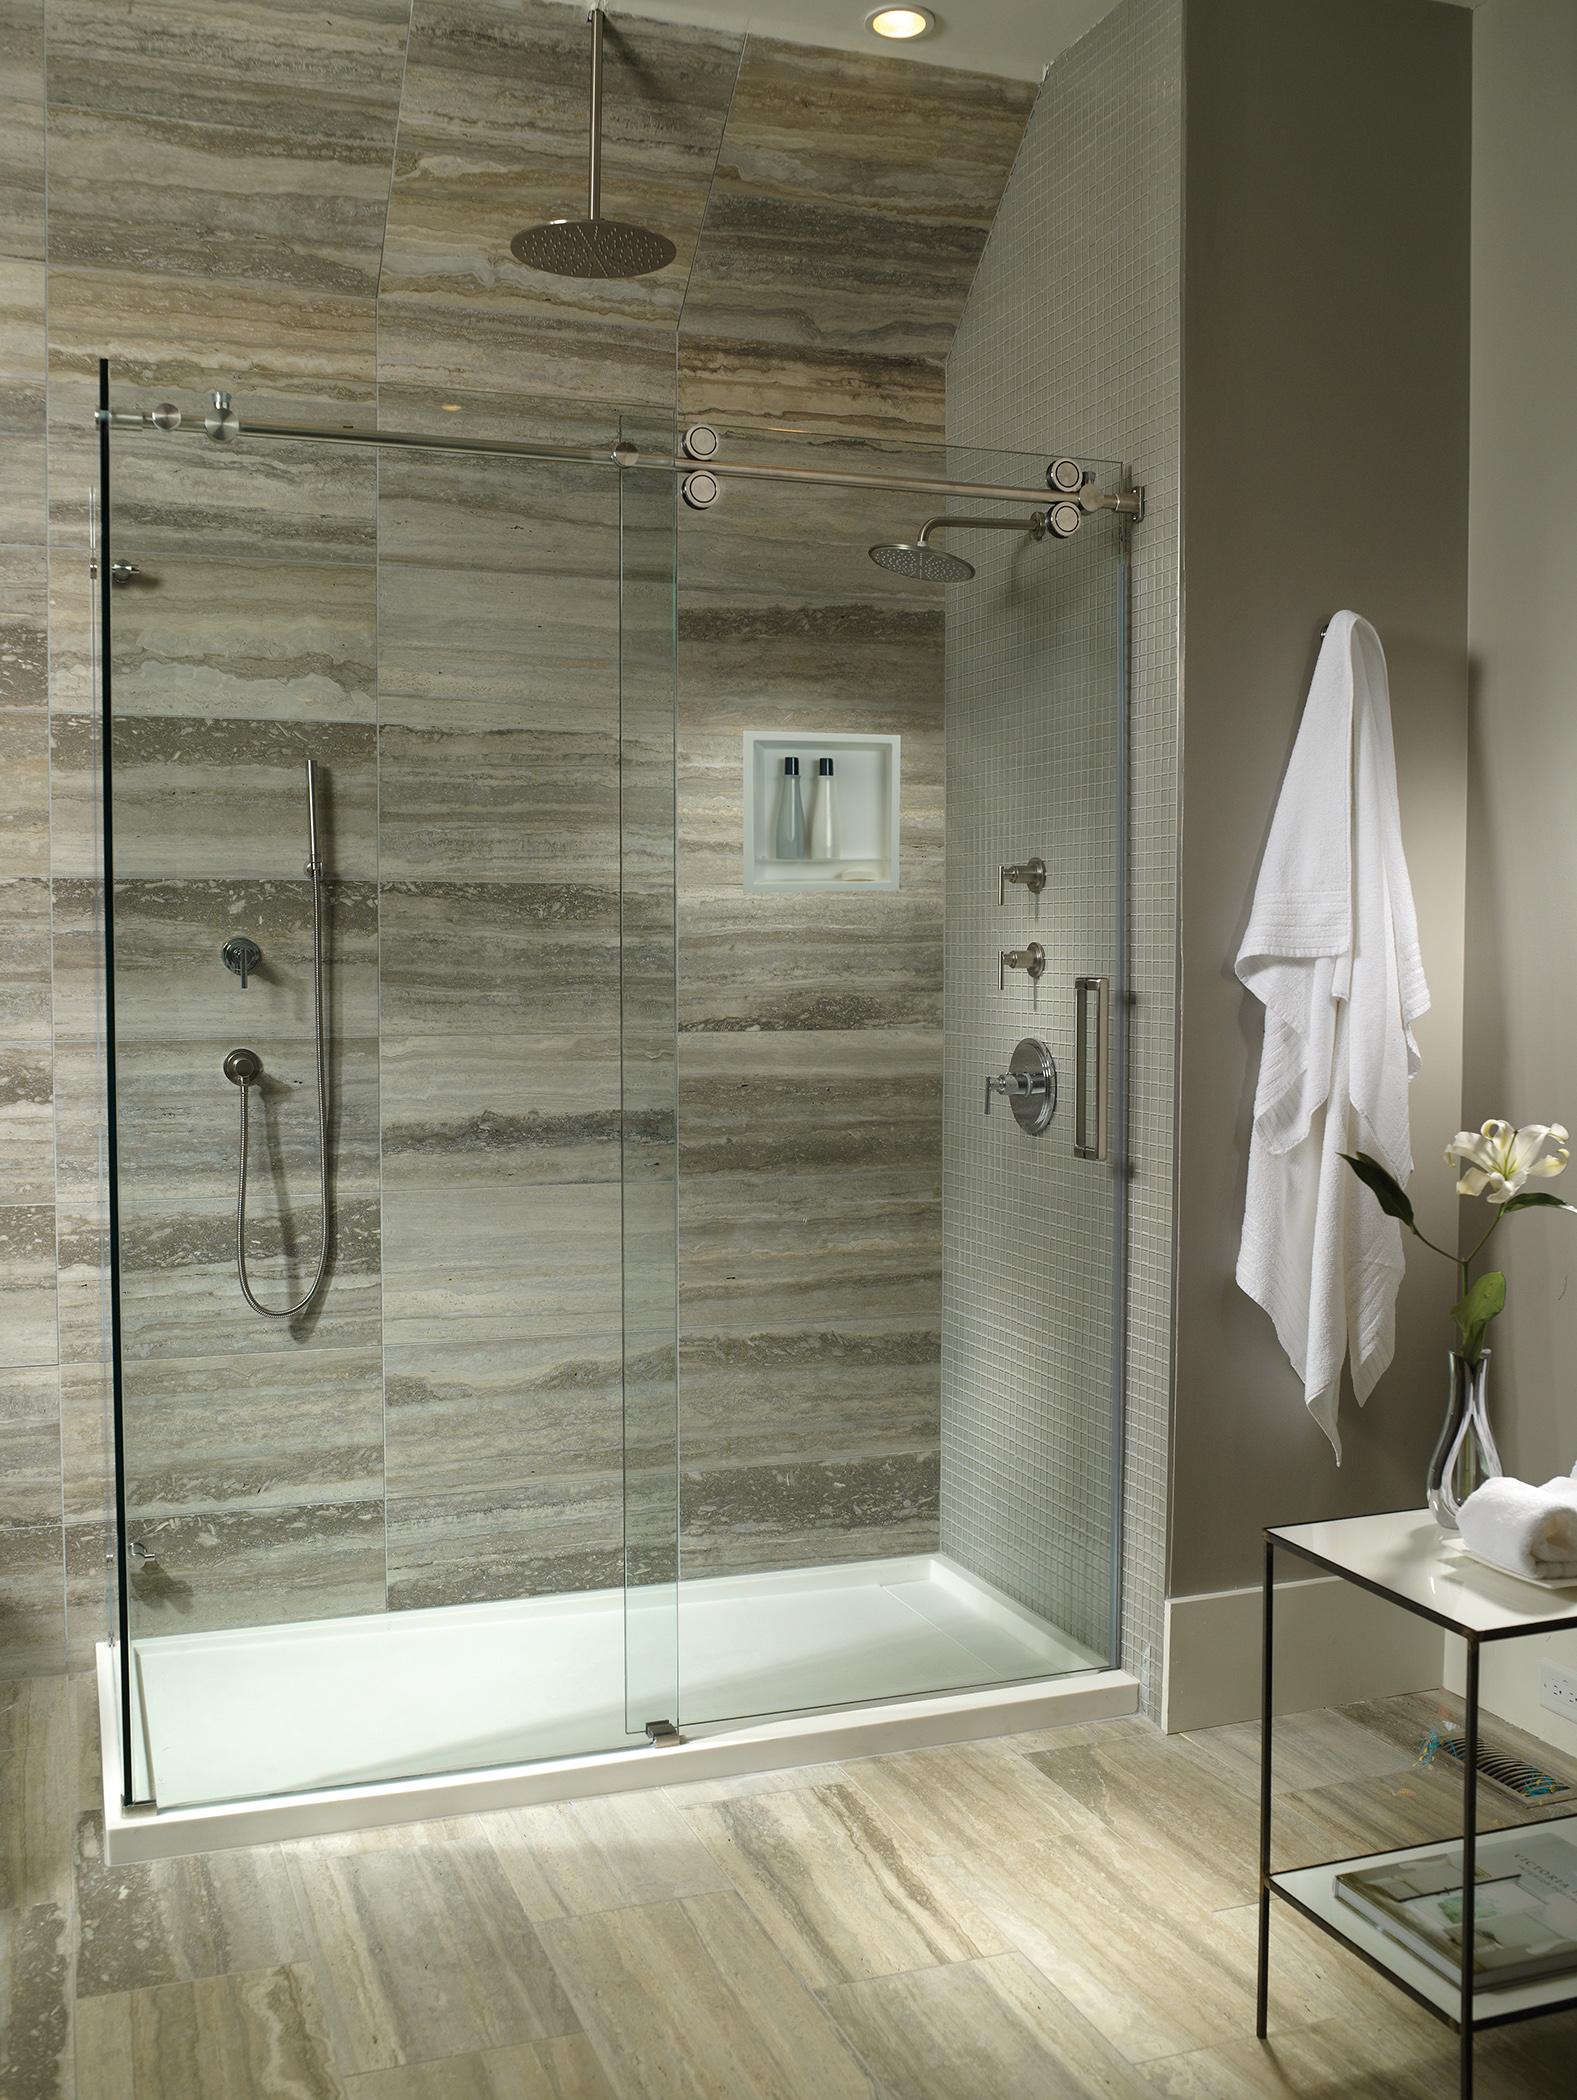 Shower-base-with-Niche